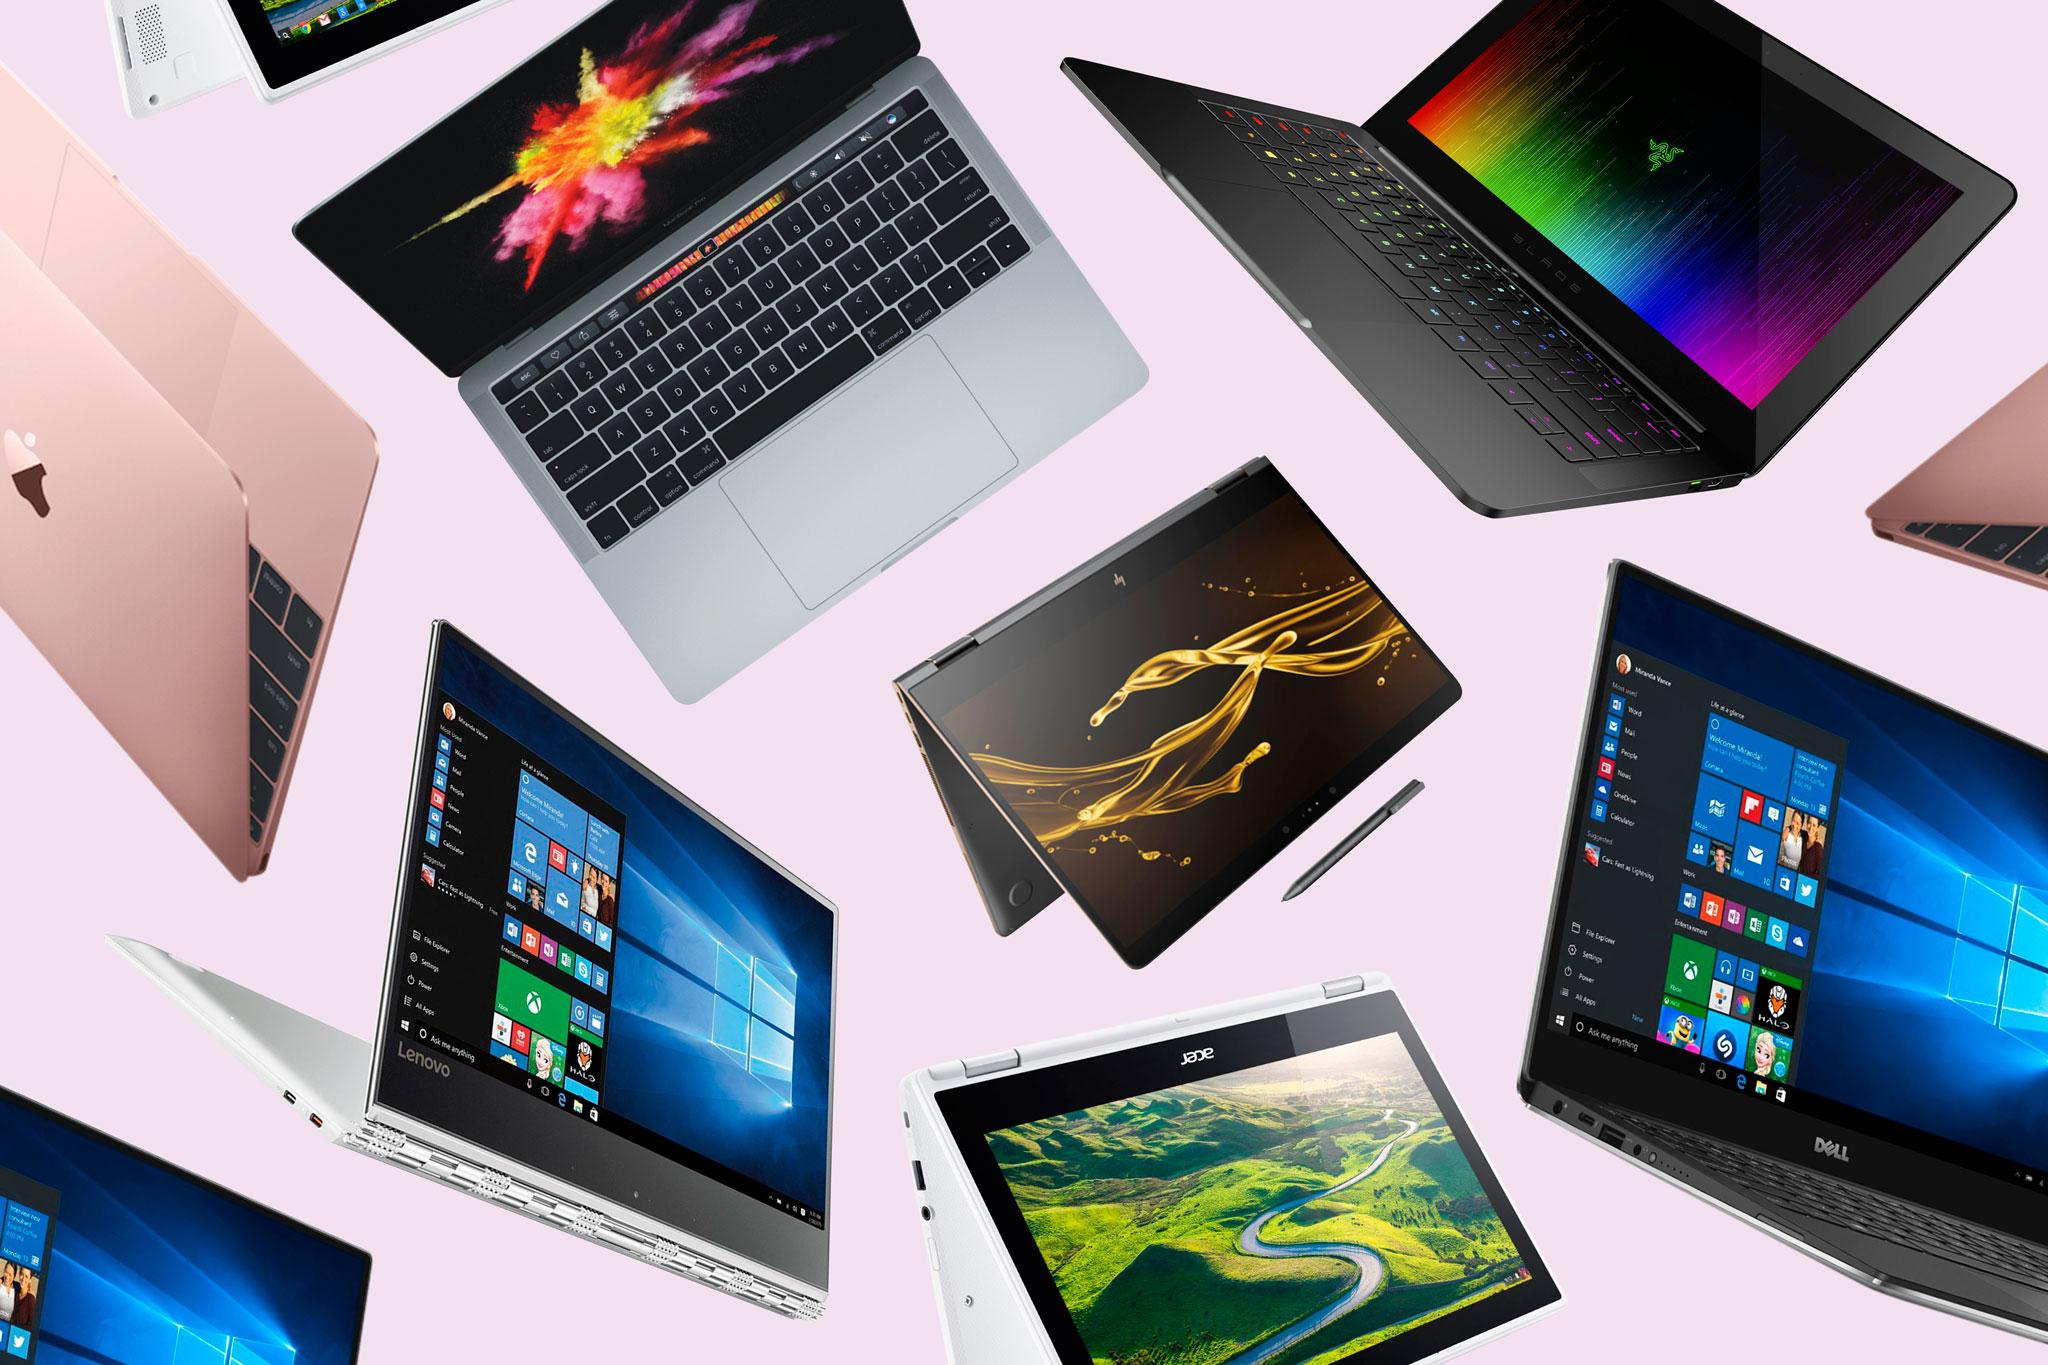 Milyen notebookot vegyek 2018-ban  - Techkalauz 2fd4dcc3c3